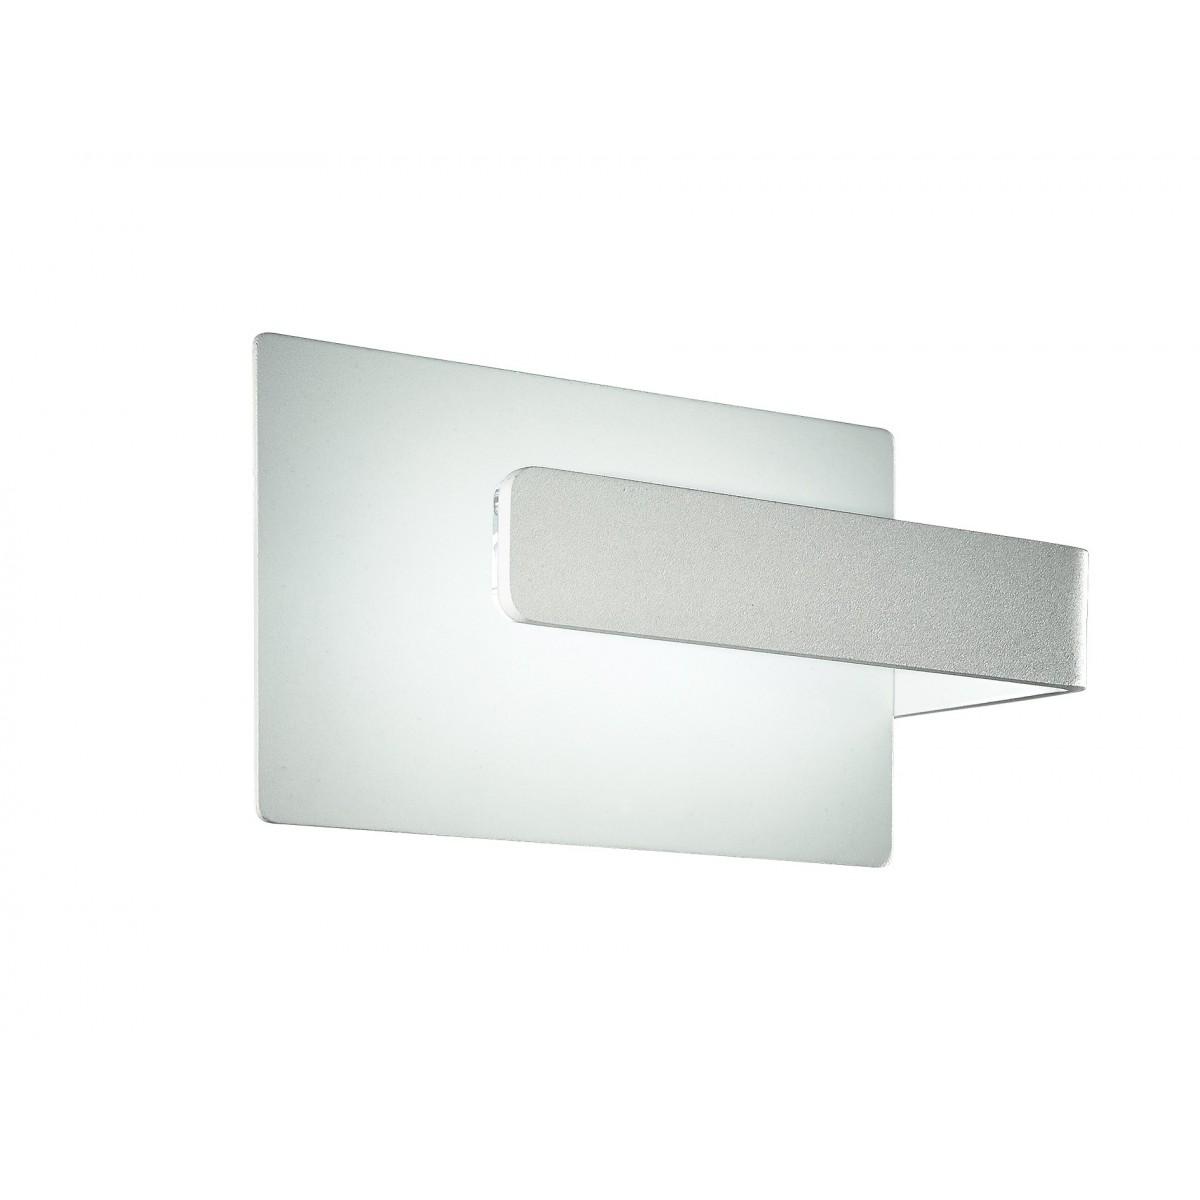 LED-W-LAMBDA/4W - Applique led dal